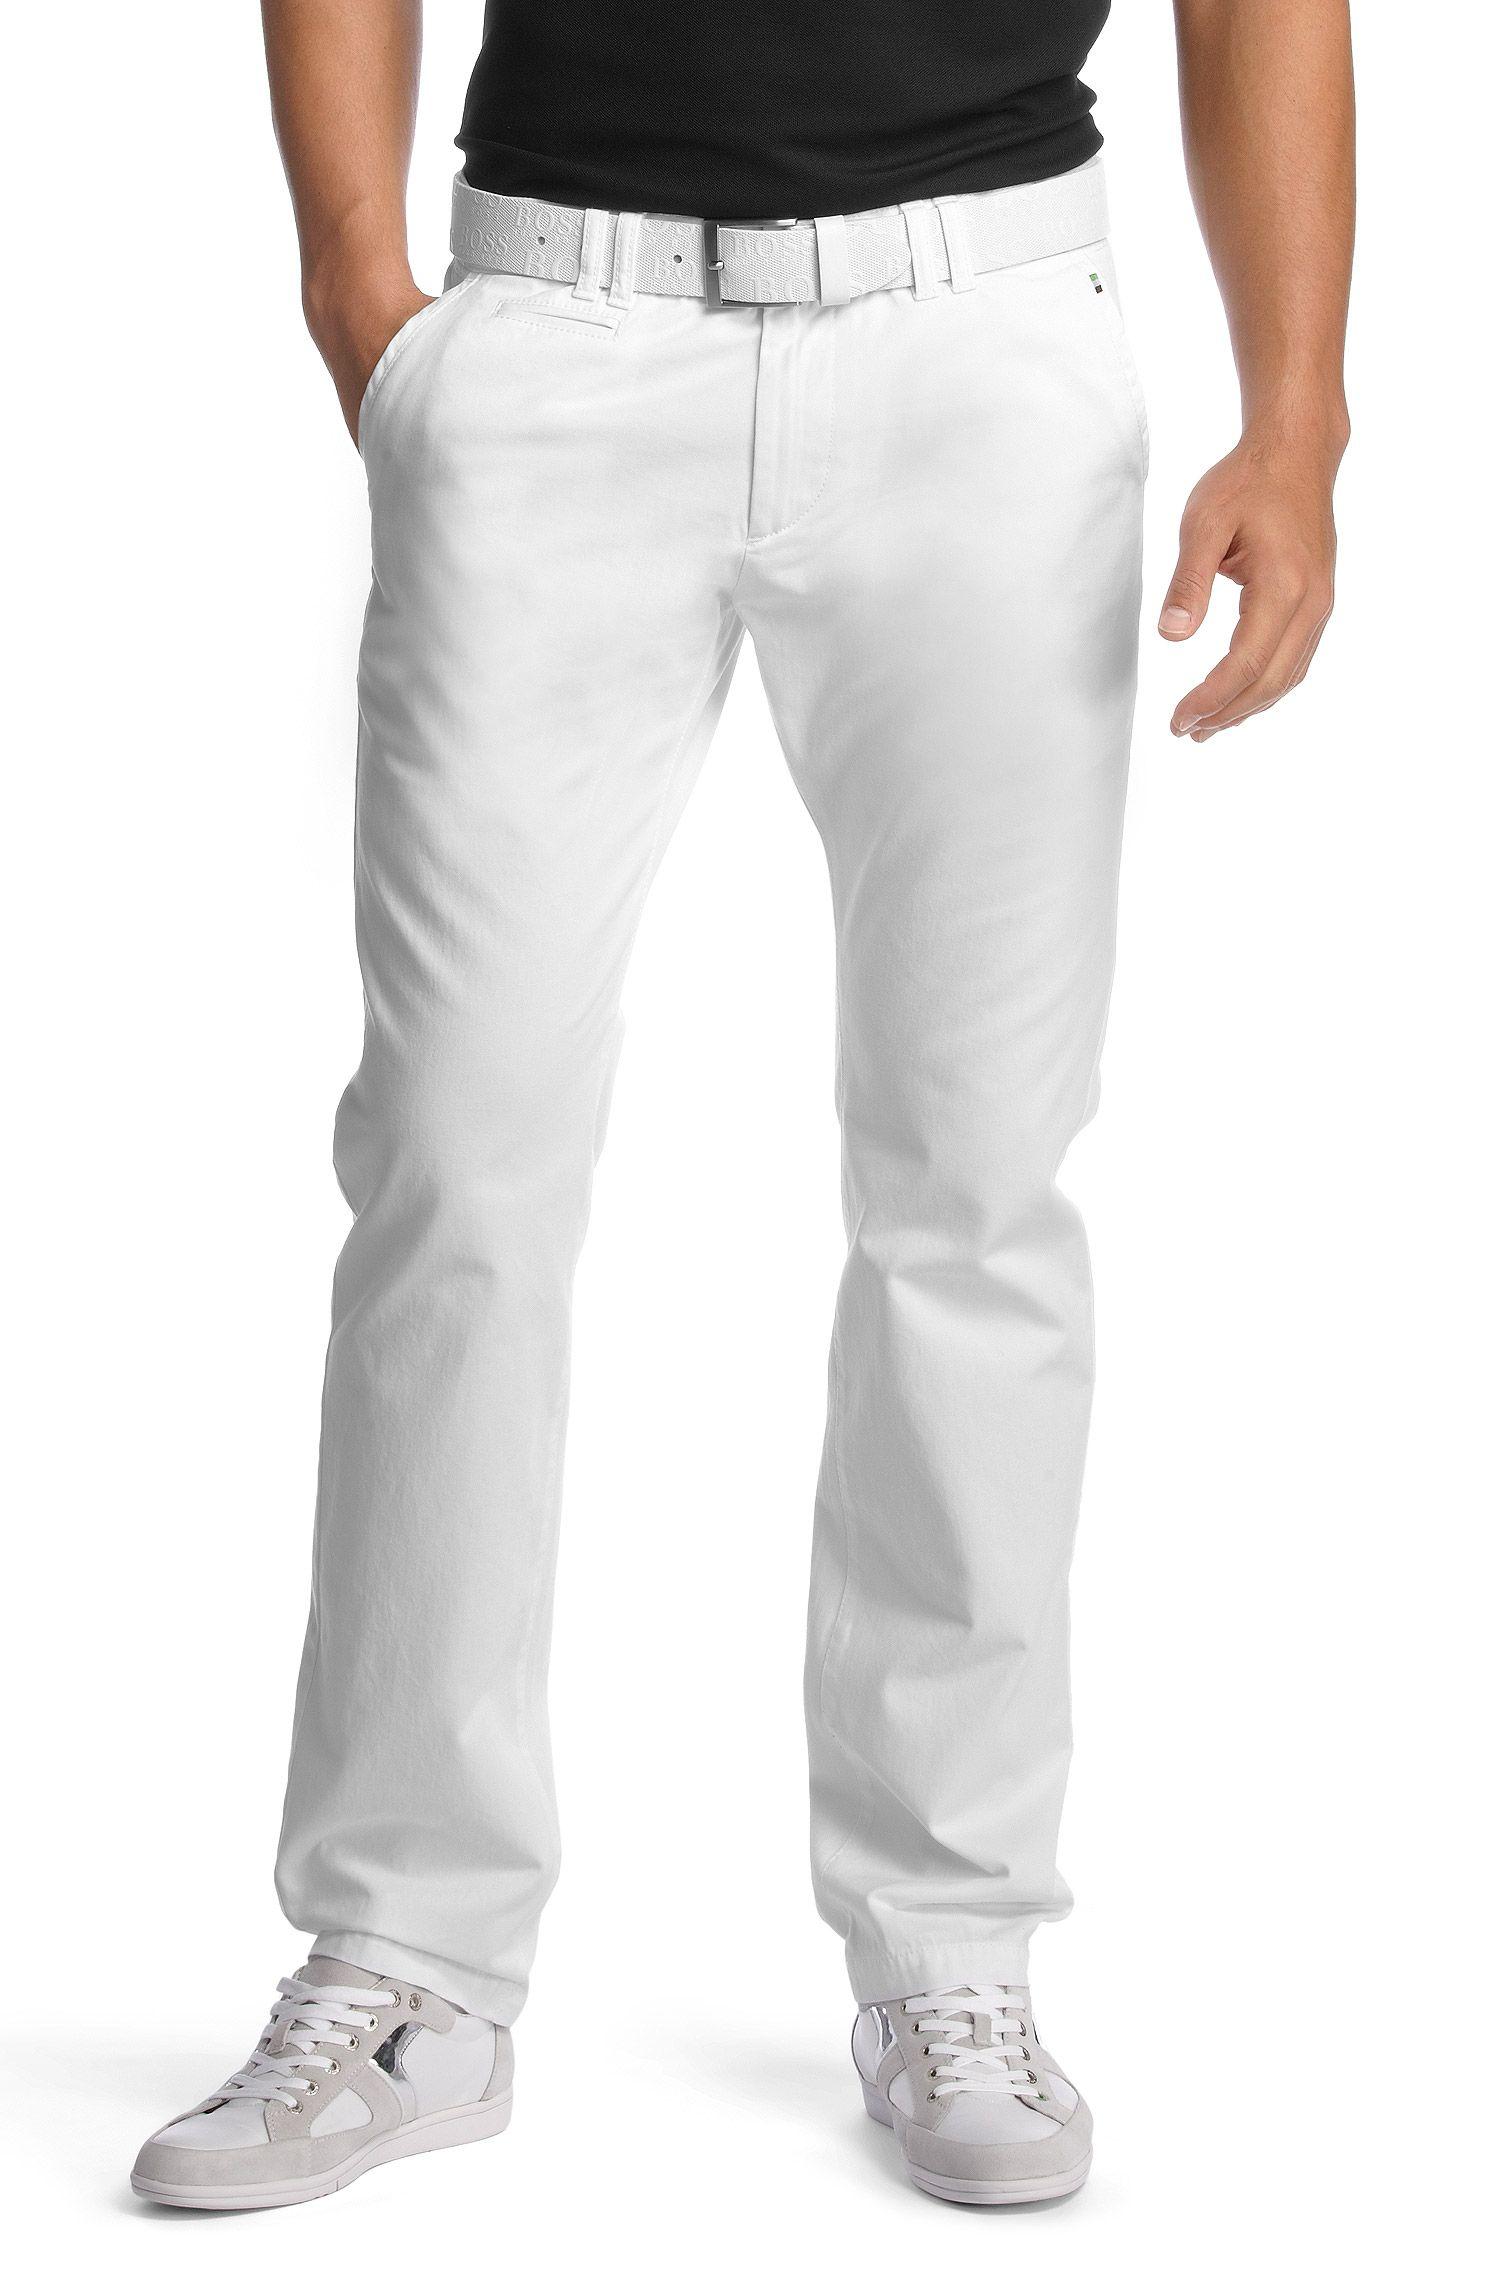 Jeans ´Lillon 2-W` met paspelzakken achter